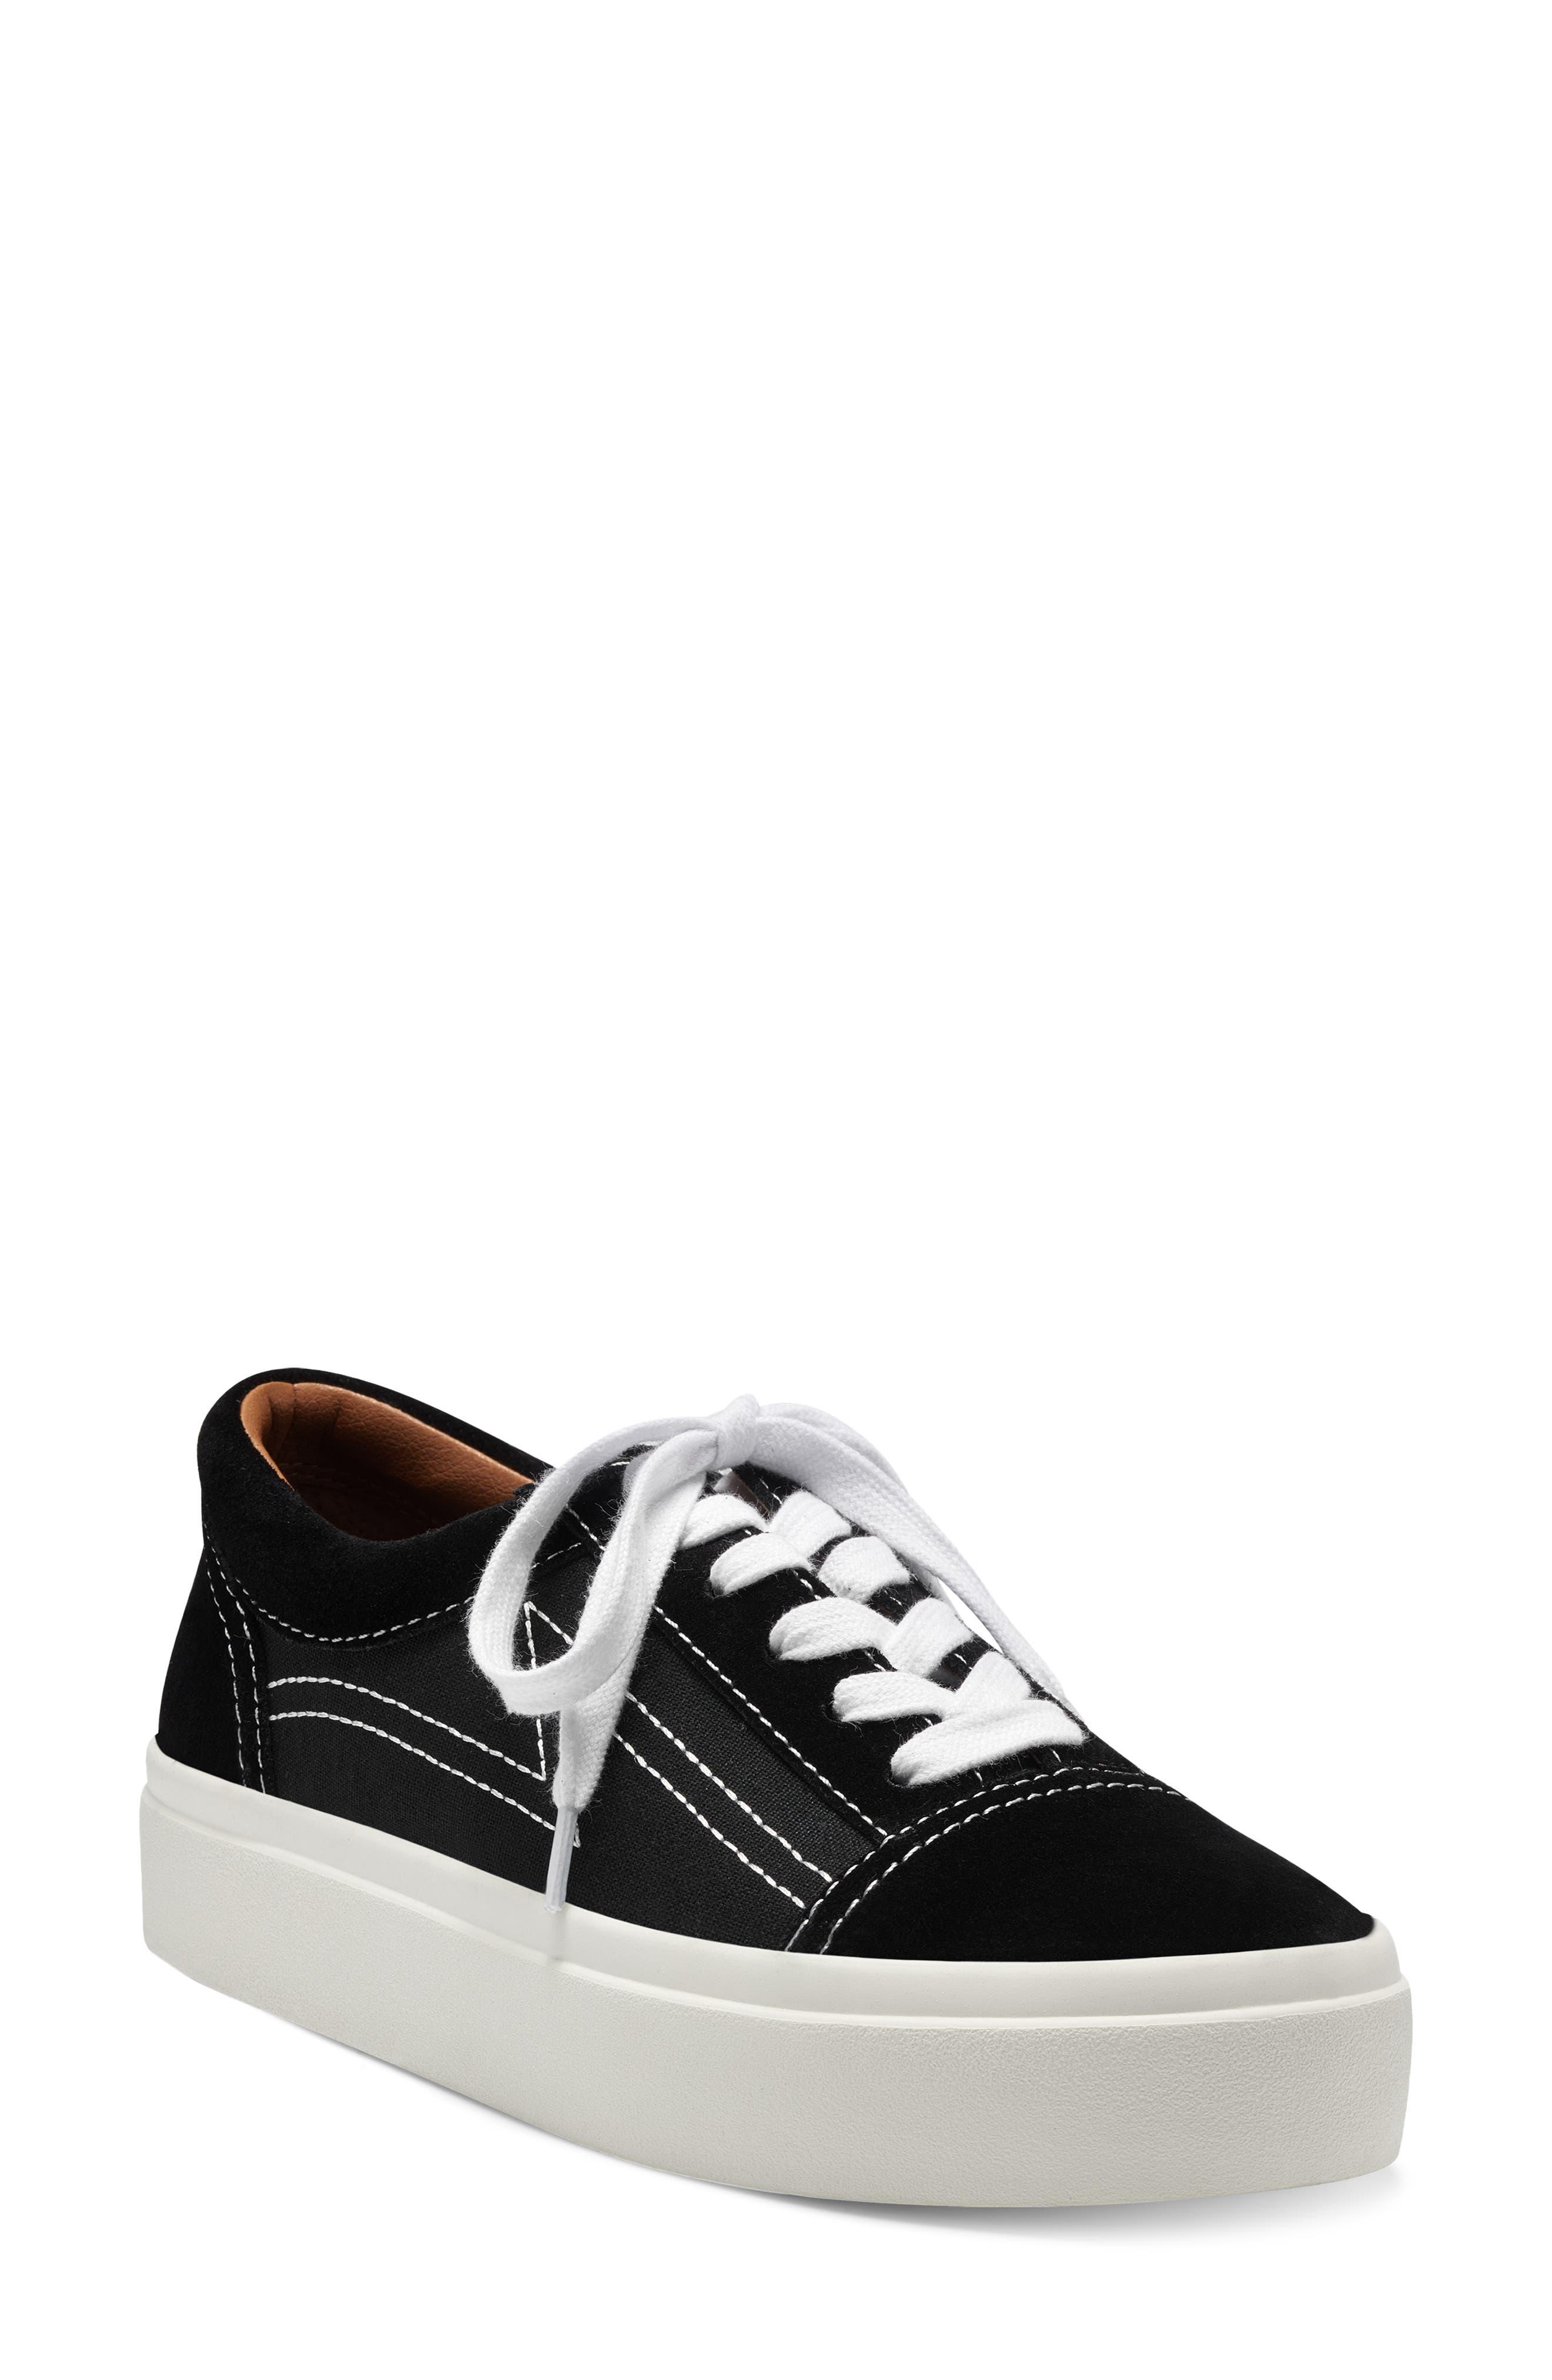 Tezra Platform Sneaker